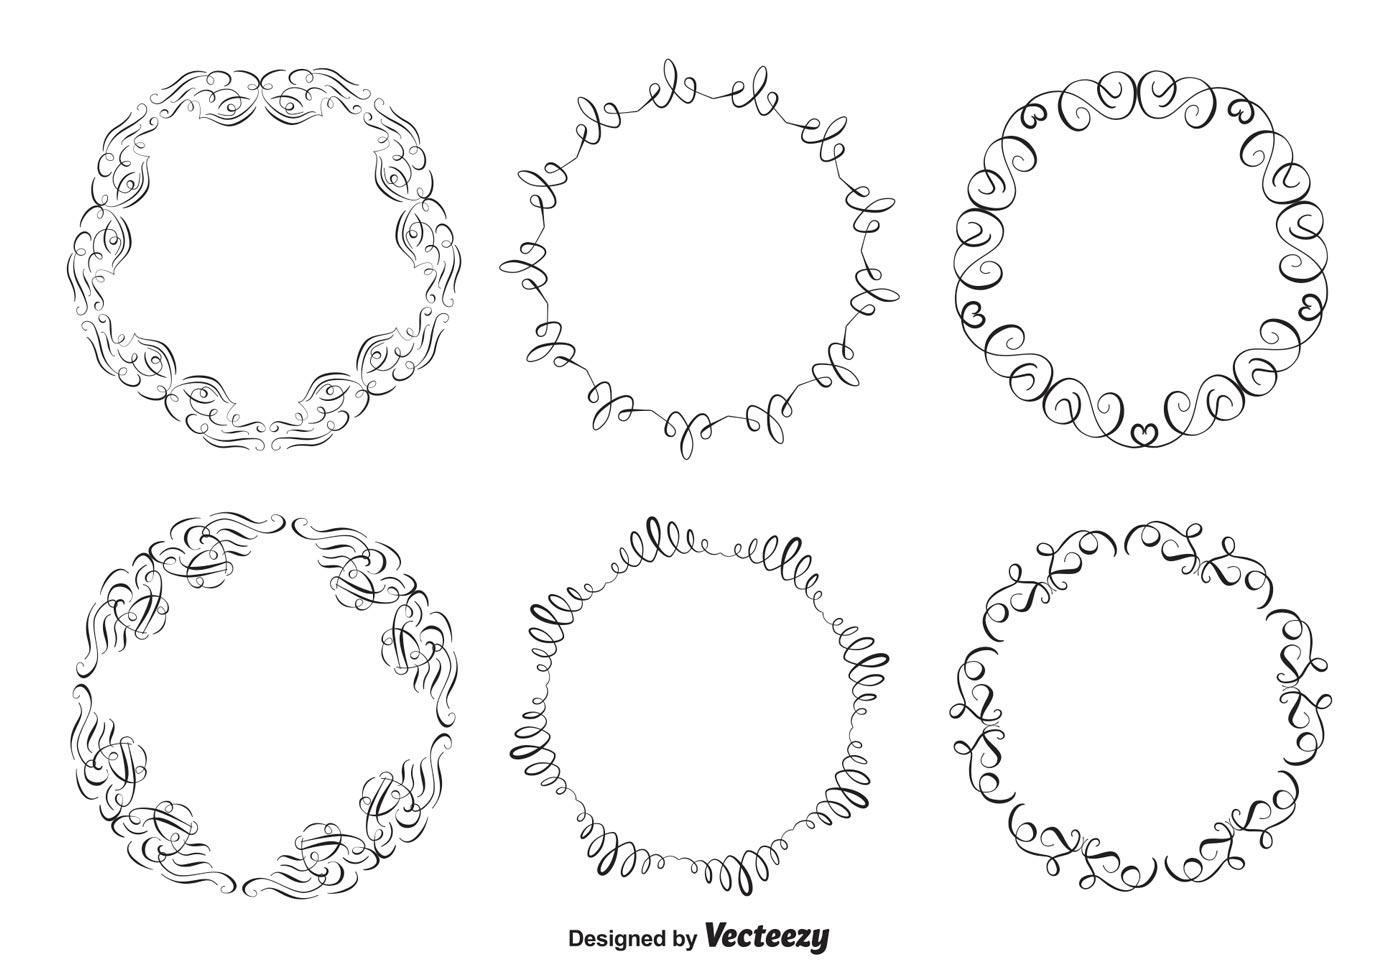 Dekorative Rahmen Set - Kostenlose Vektor-Kunst, Archiv-Grafiken ...